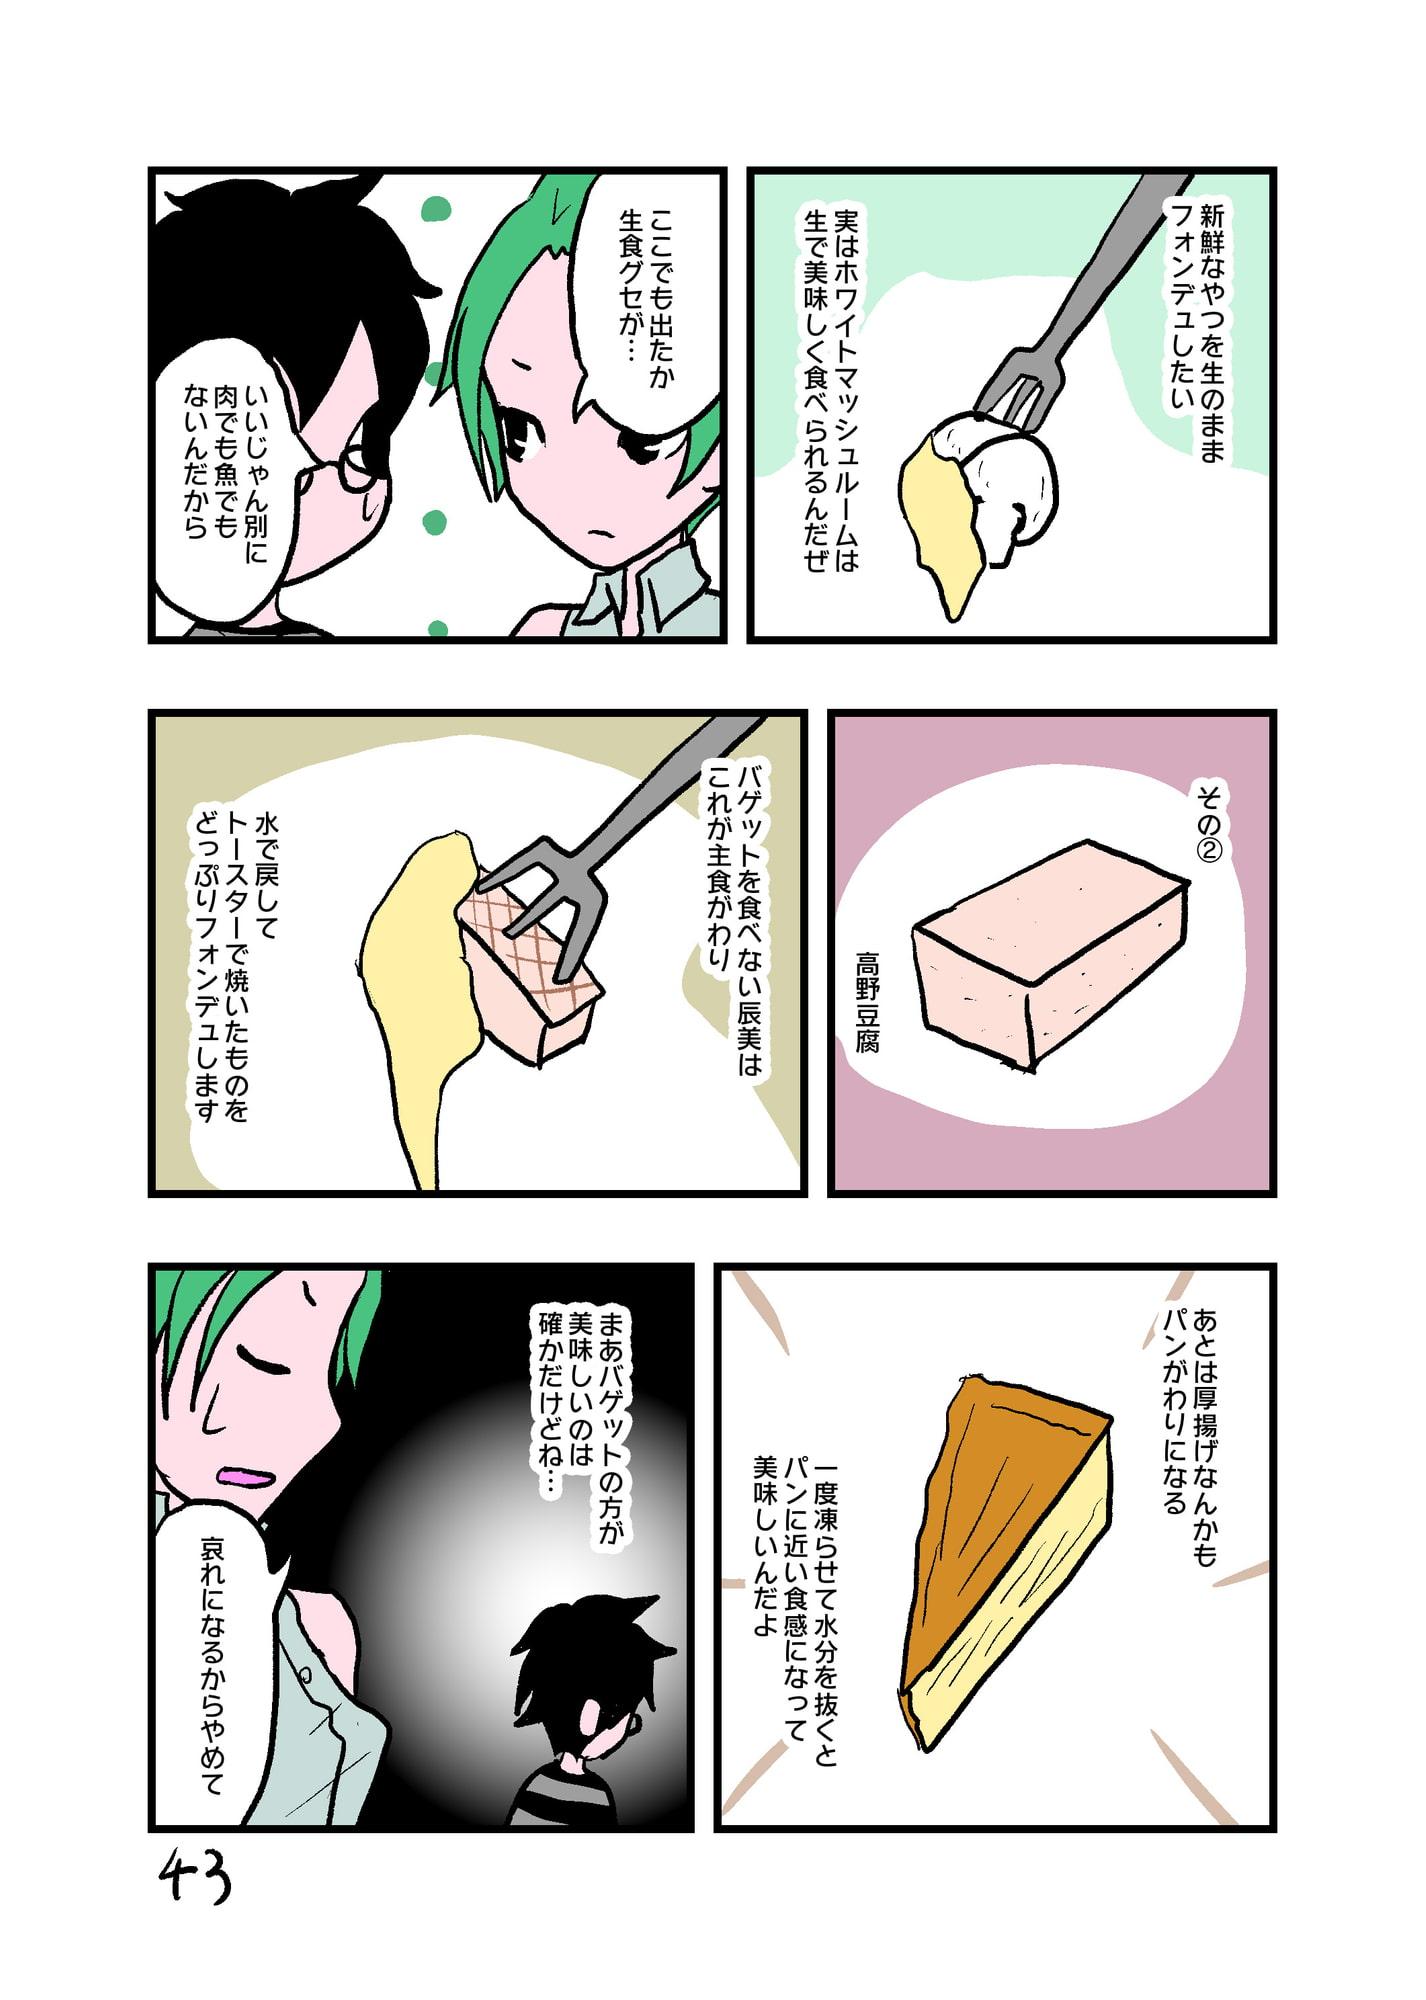 辰美の日常酒飯事本